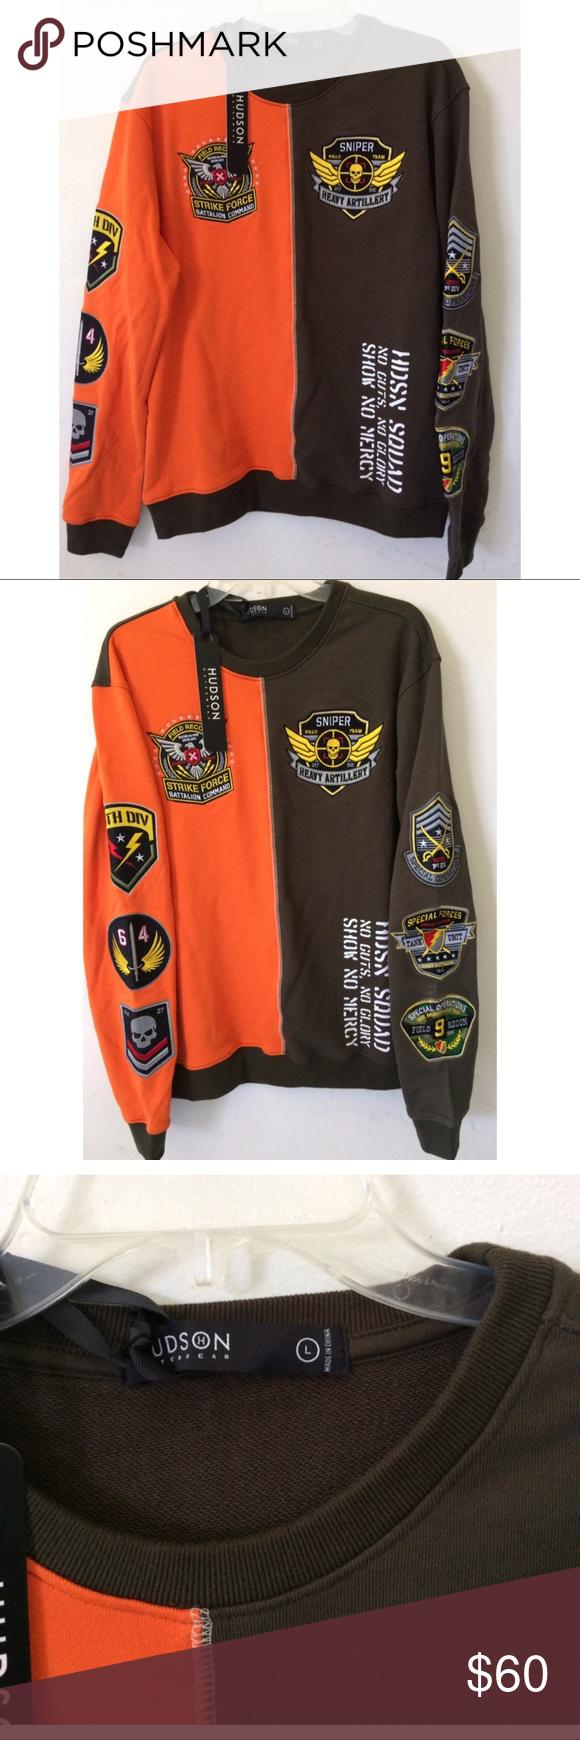 Nwt Hudson Outerwear Strike Force Sweater Nwt Hudson Outerwear Strike Force Sweater Color Orange Olive Green Hudson O Clothes Design Fashion Design Fashion [ 1740 x 580 Pixel ]